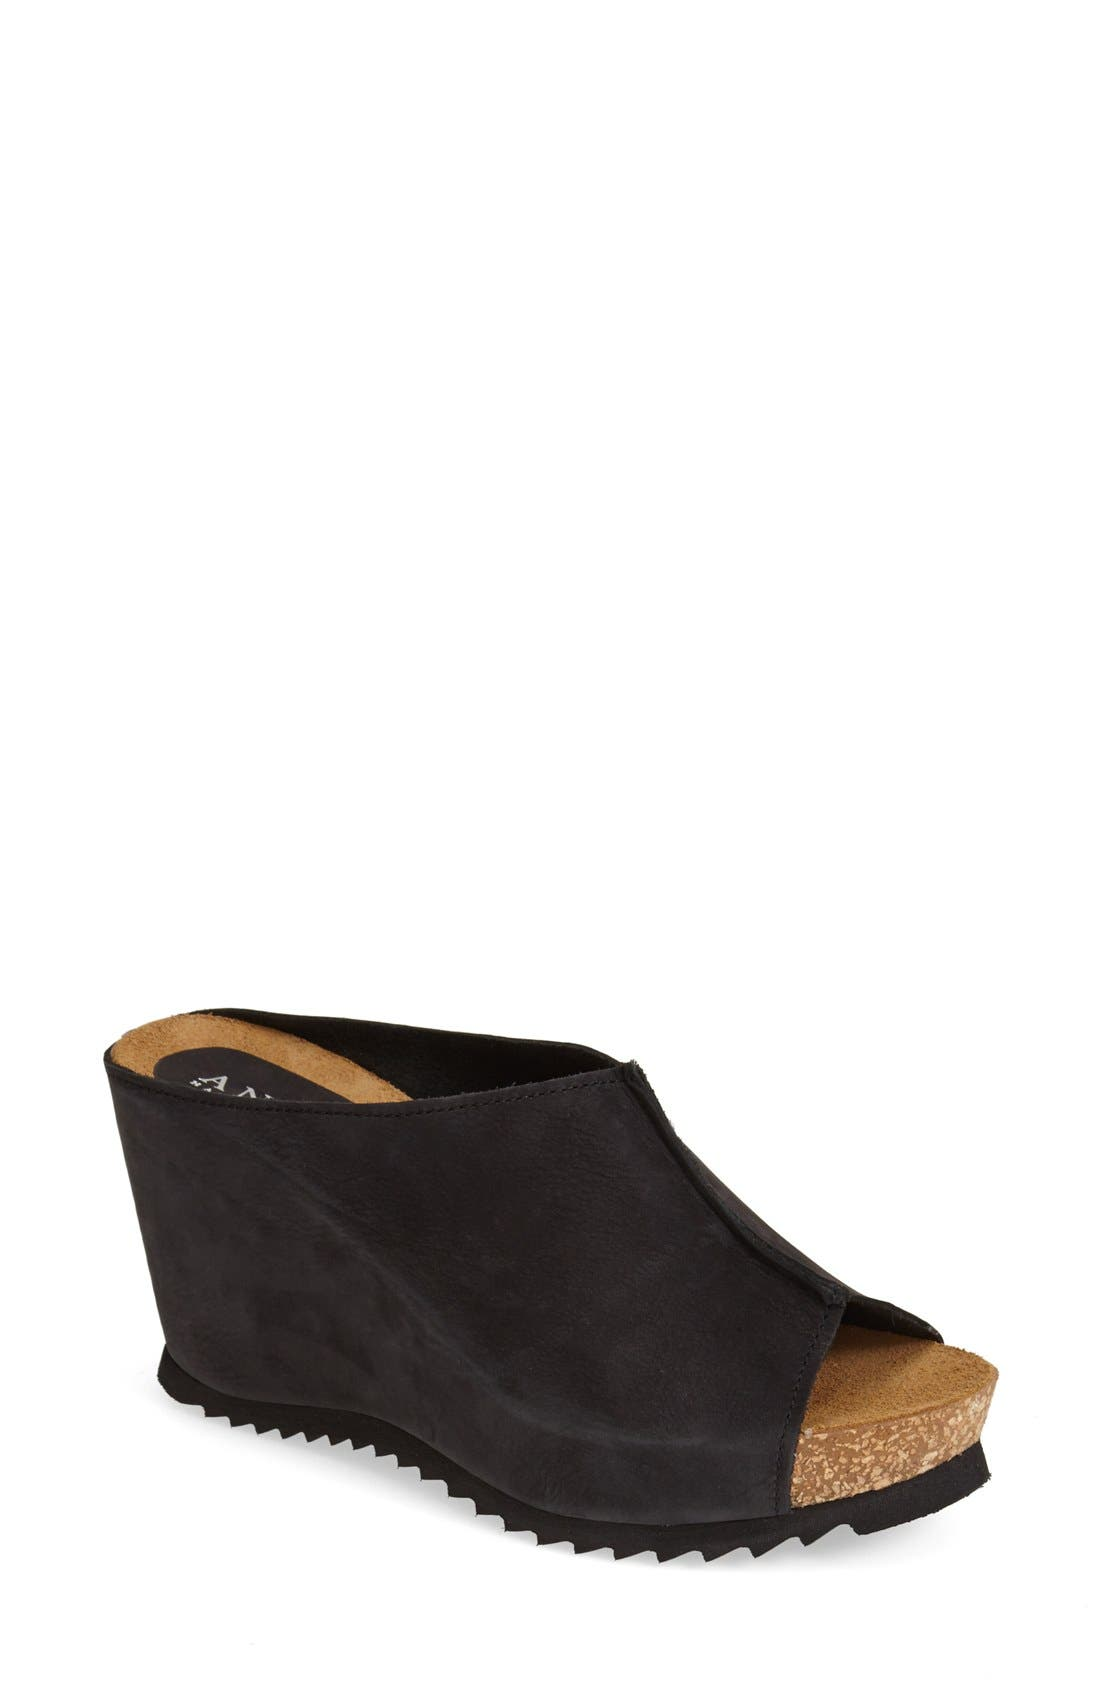 Main Image - Anyi Lu 'Sara' Nubuck Leather Peep Toe Mule Wedge (Women)